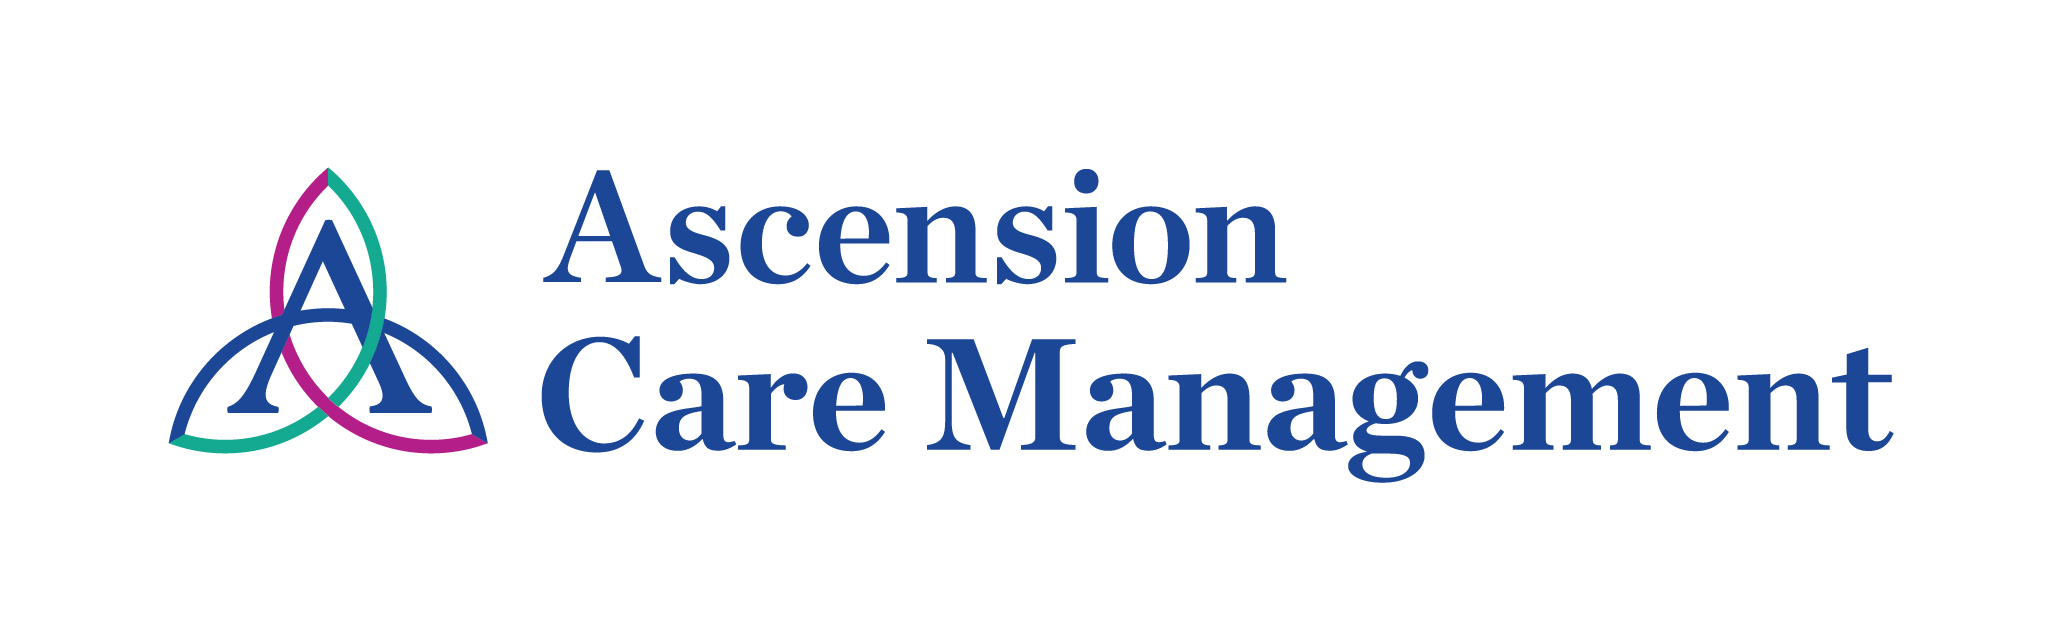 ascension_care_management